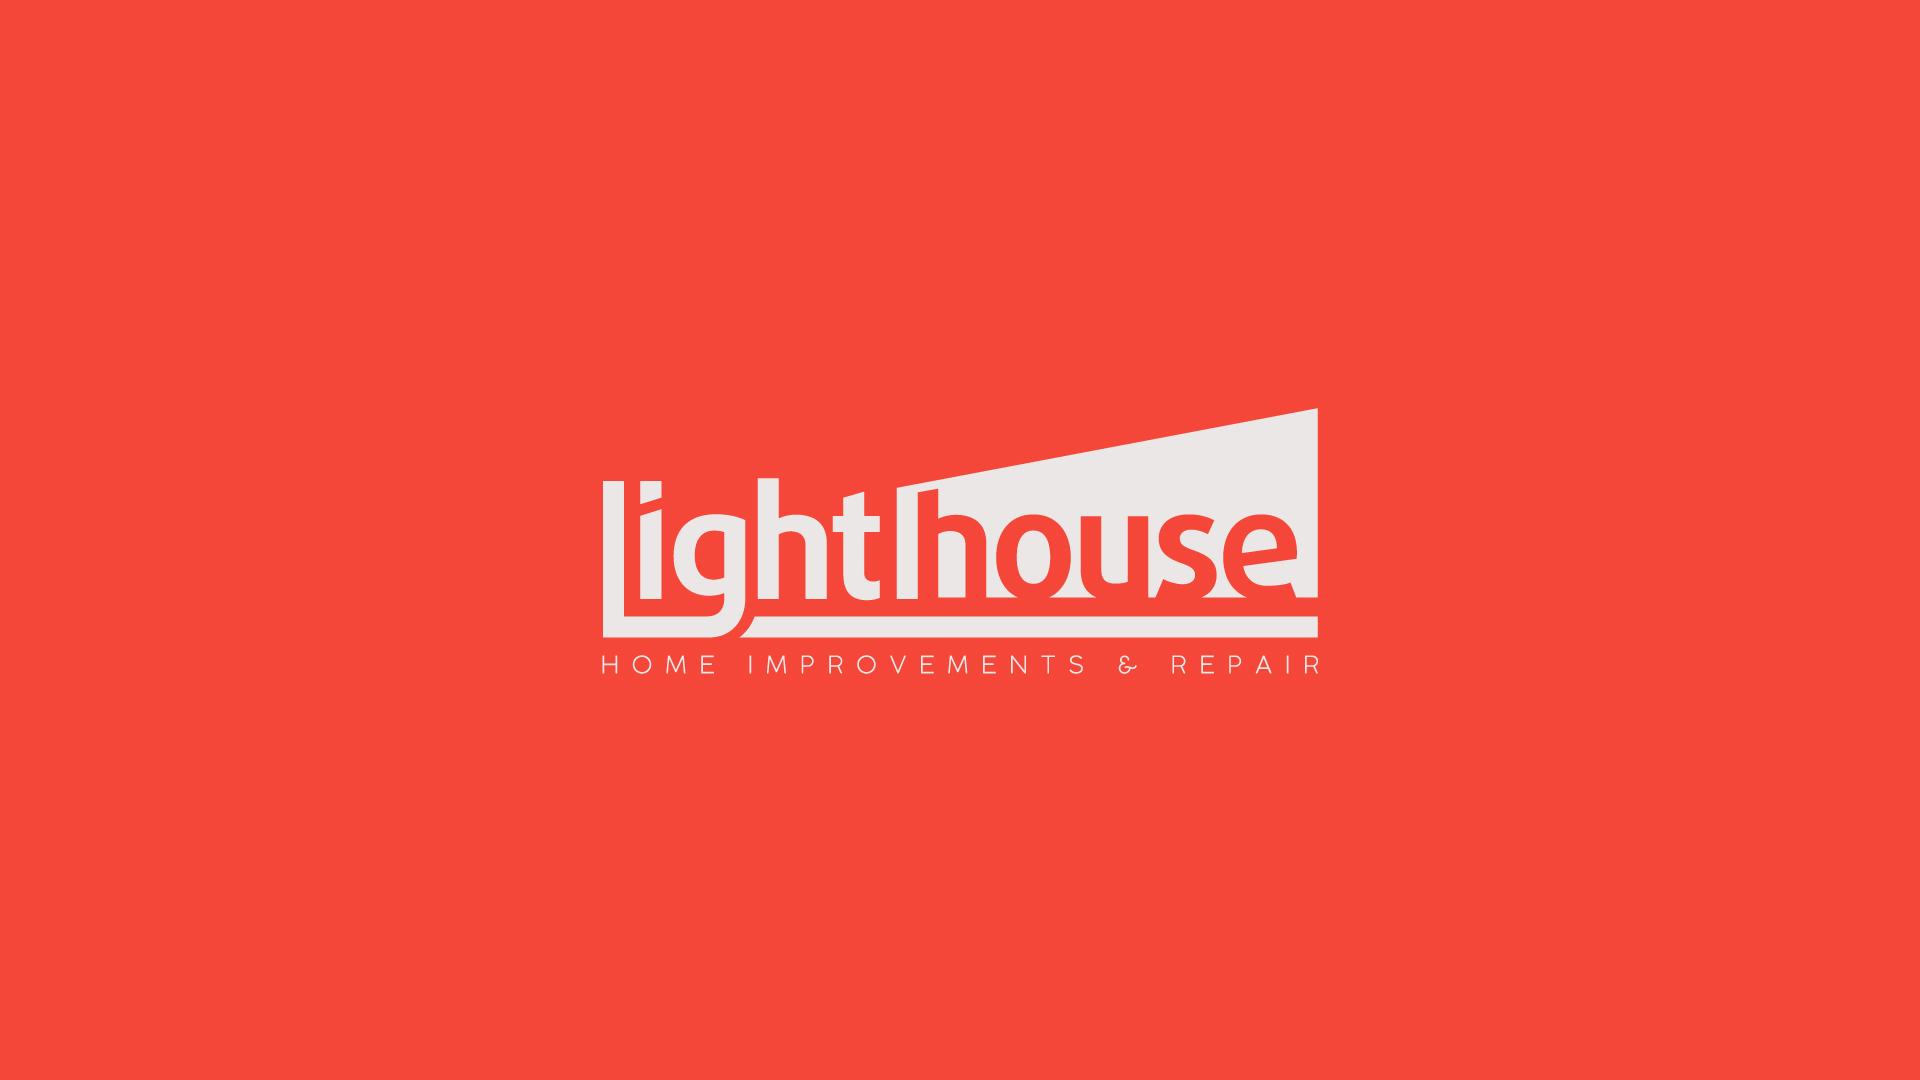 18_01_05_Lighthouse_Logo_R